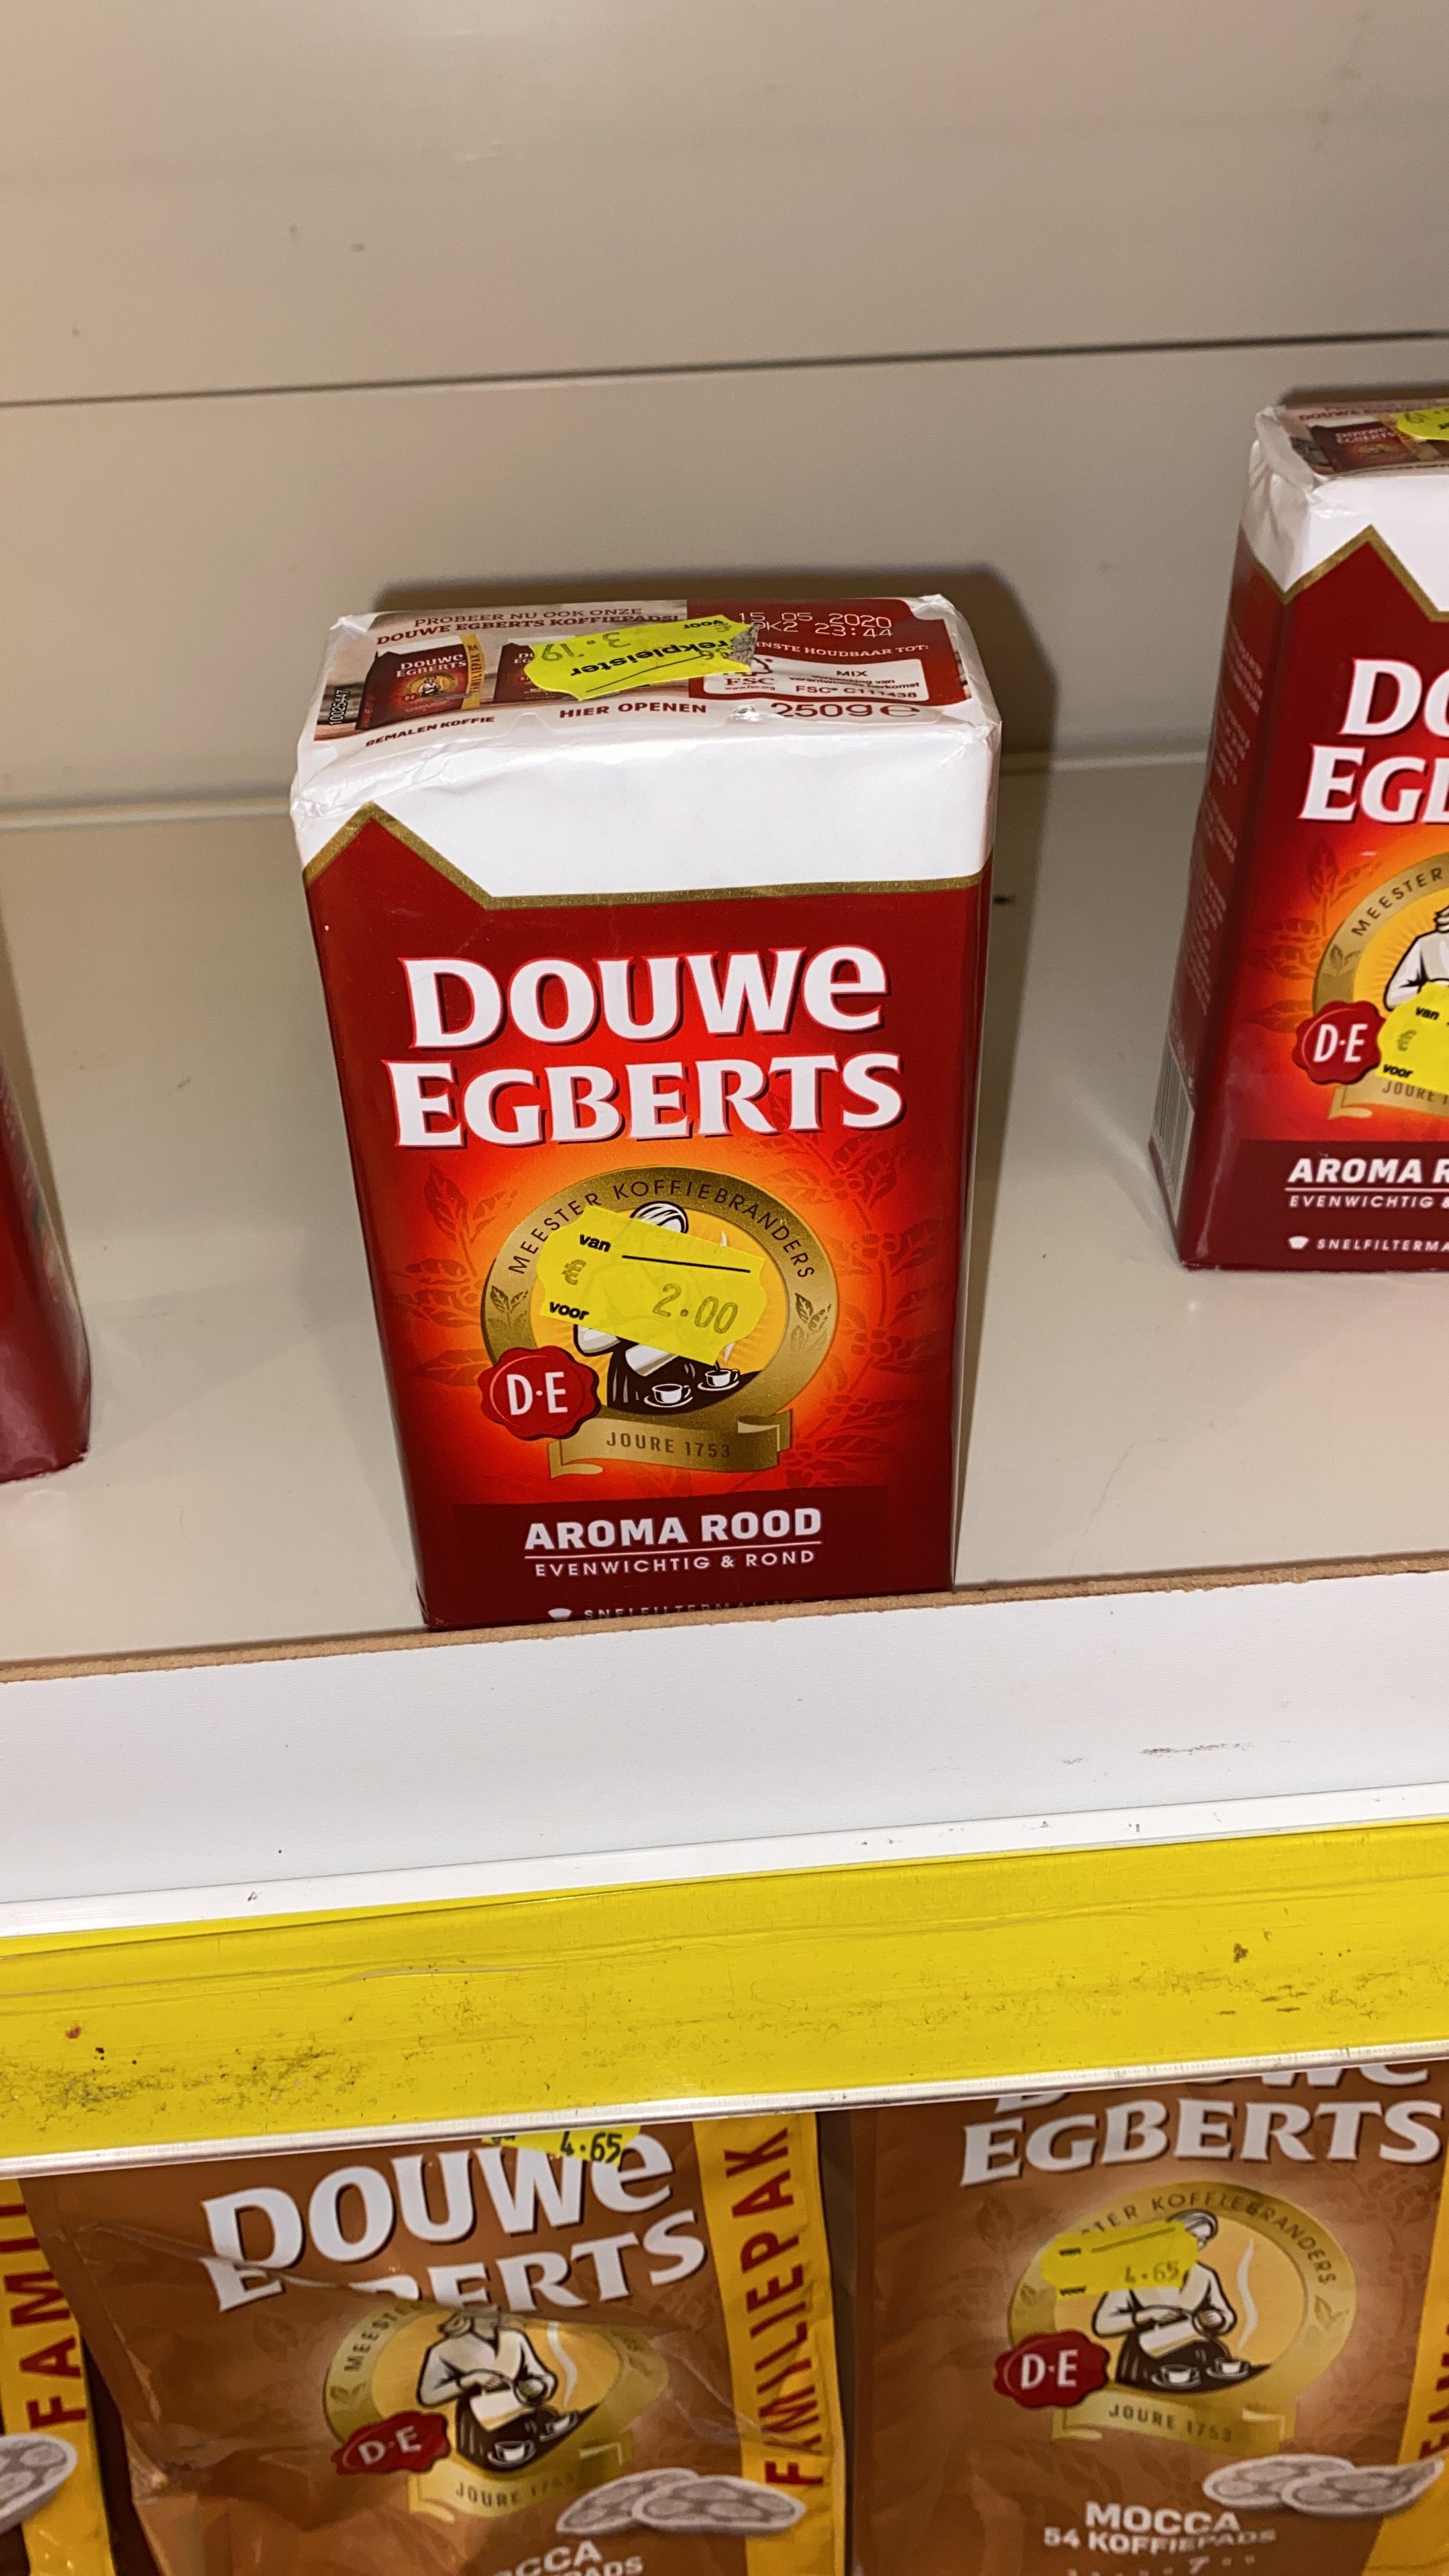 (Lokaal) Douwe Egberts Aroma Rood voor €2,-